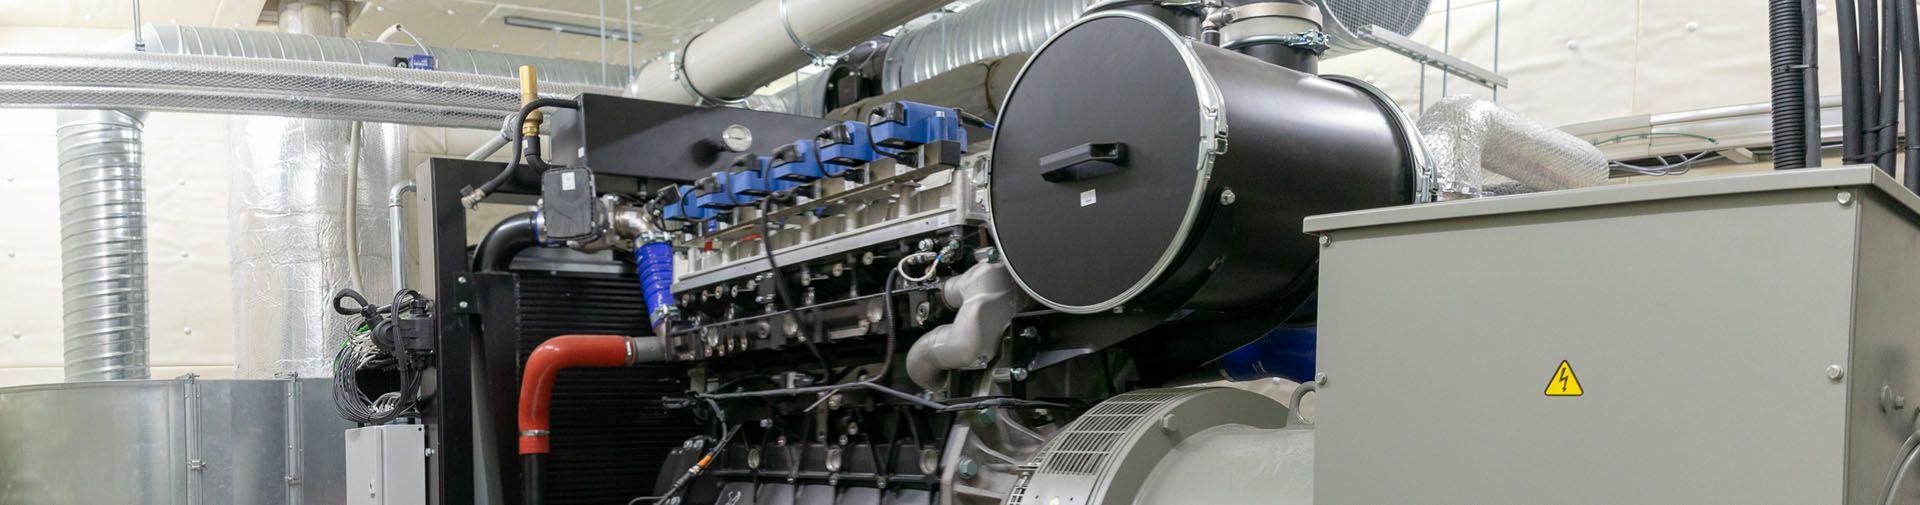 Holzgas-Blockheizkraftwerk BHKW ECO 165 HG